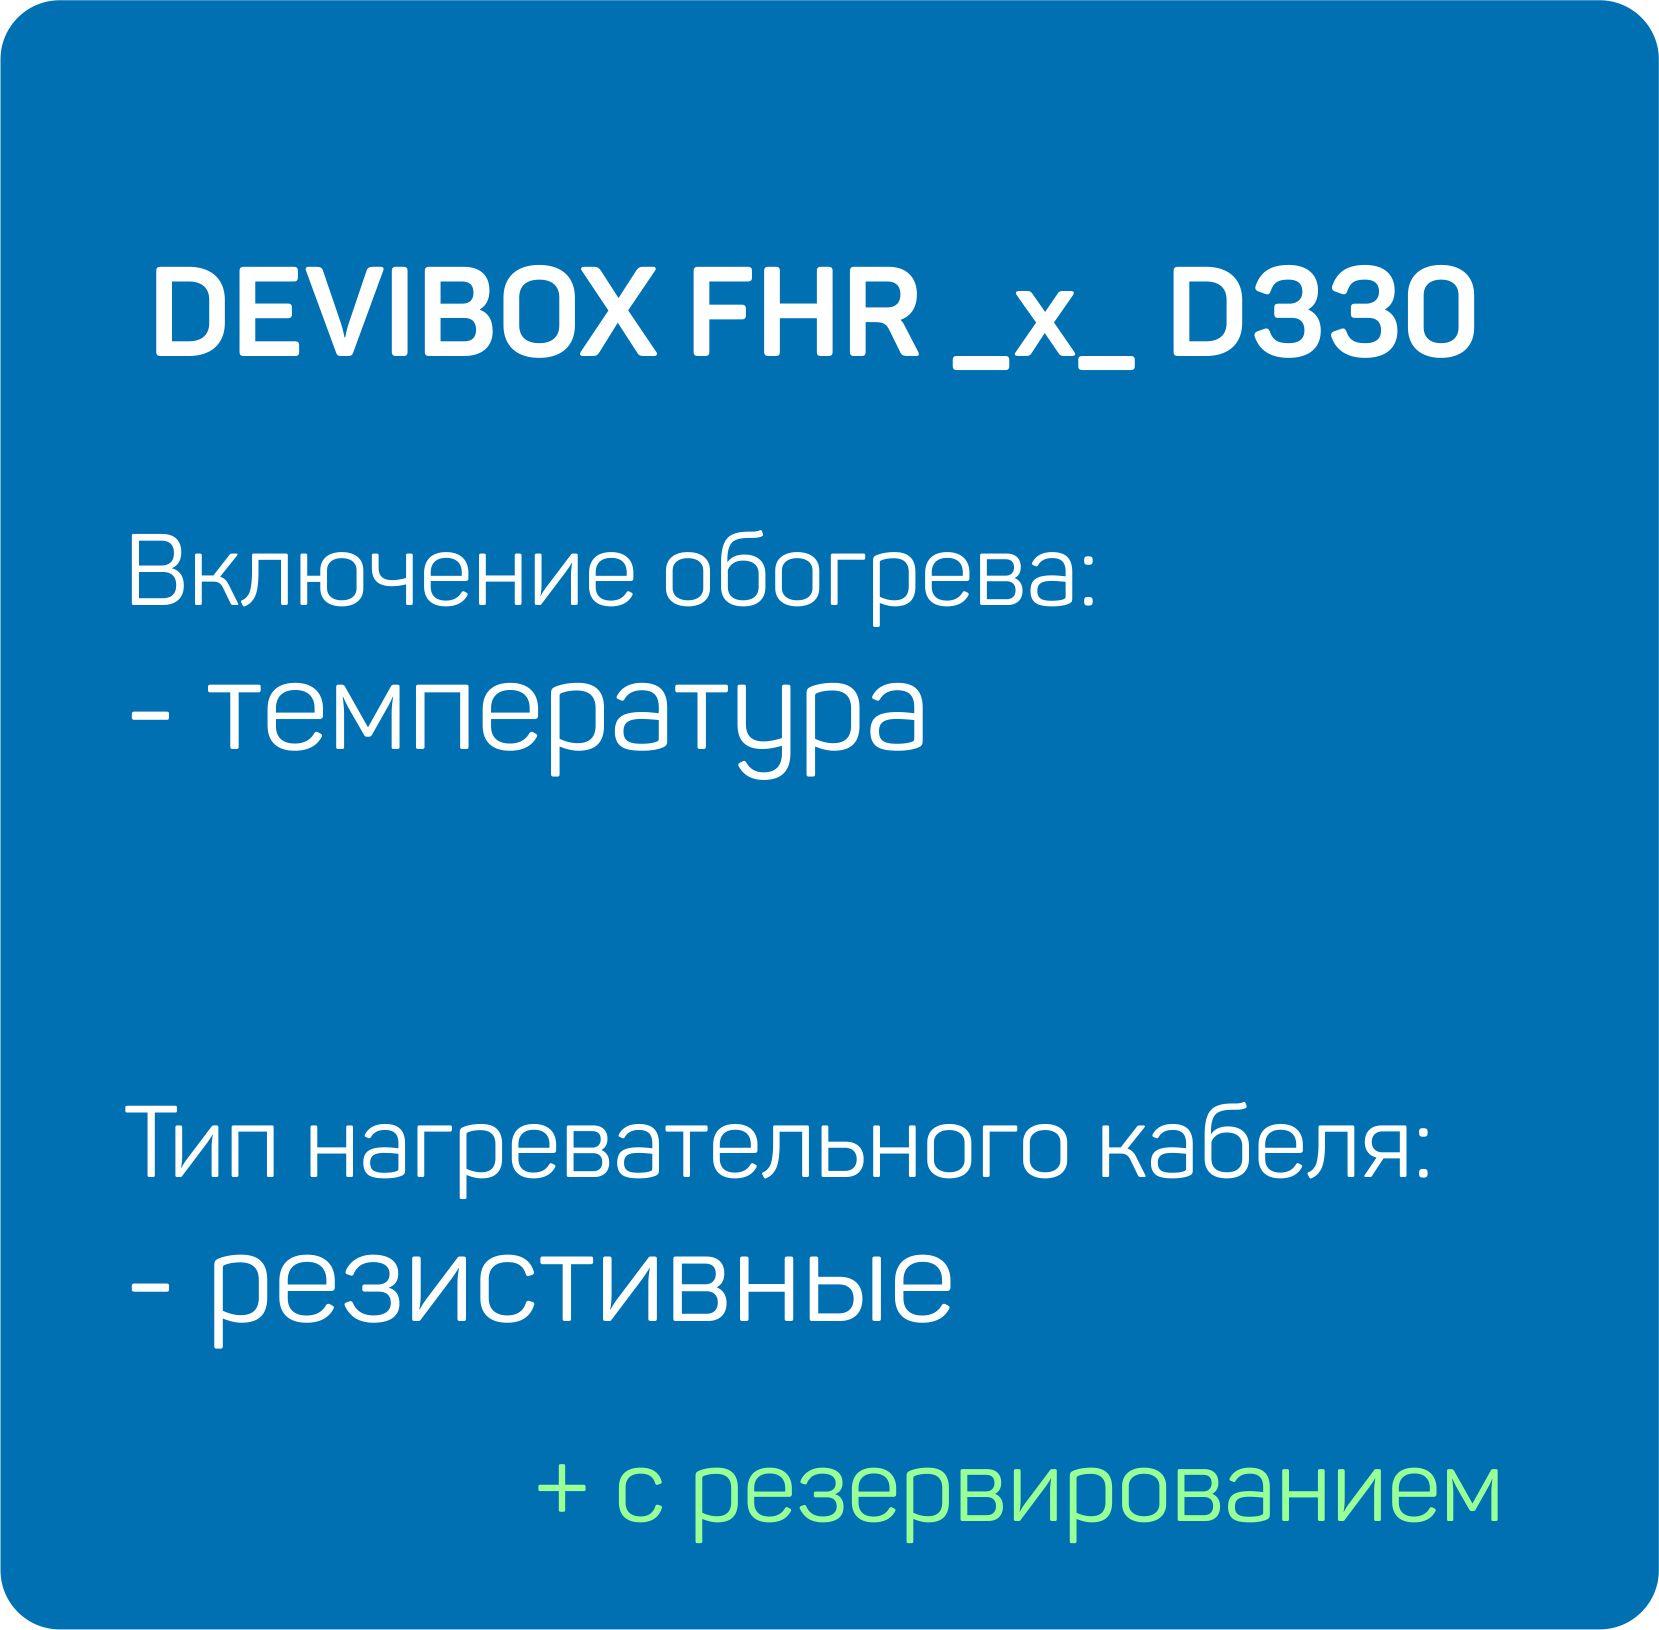 FHR _x_ D330